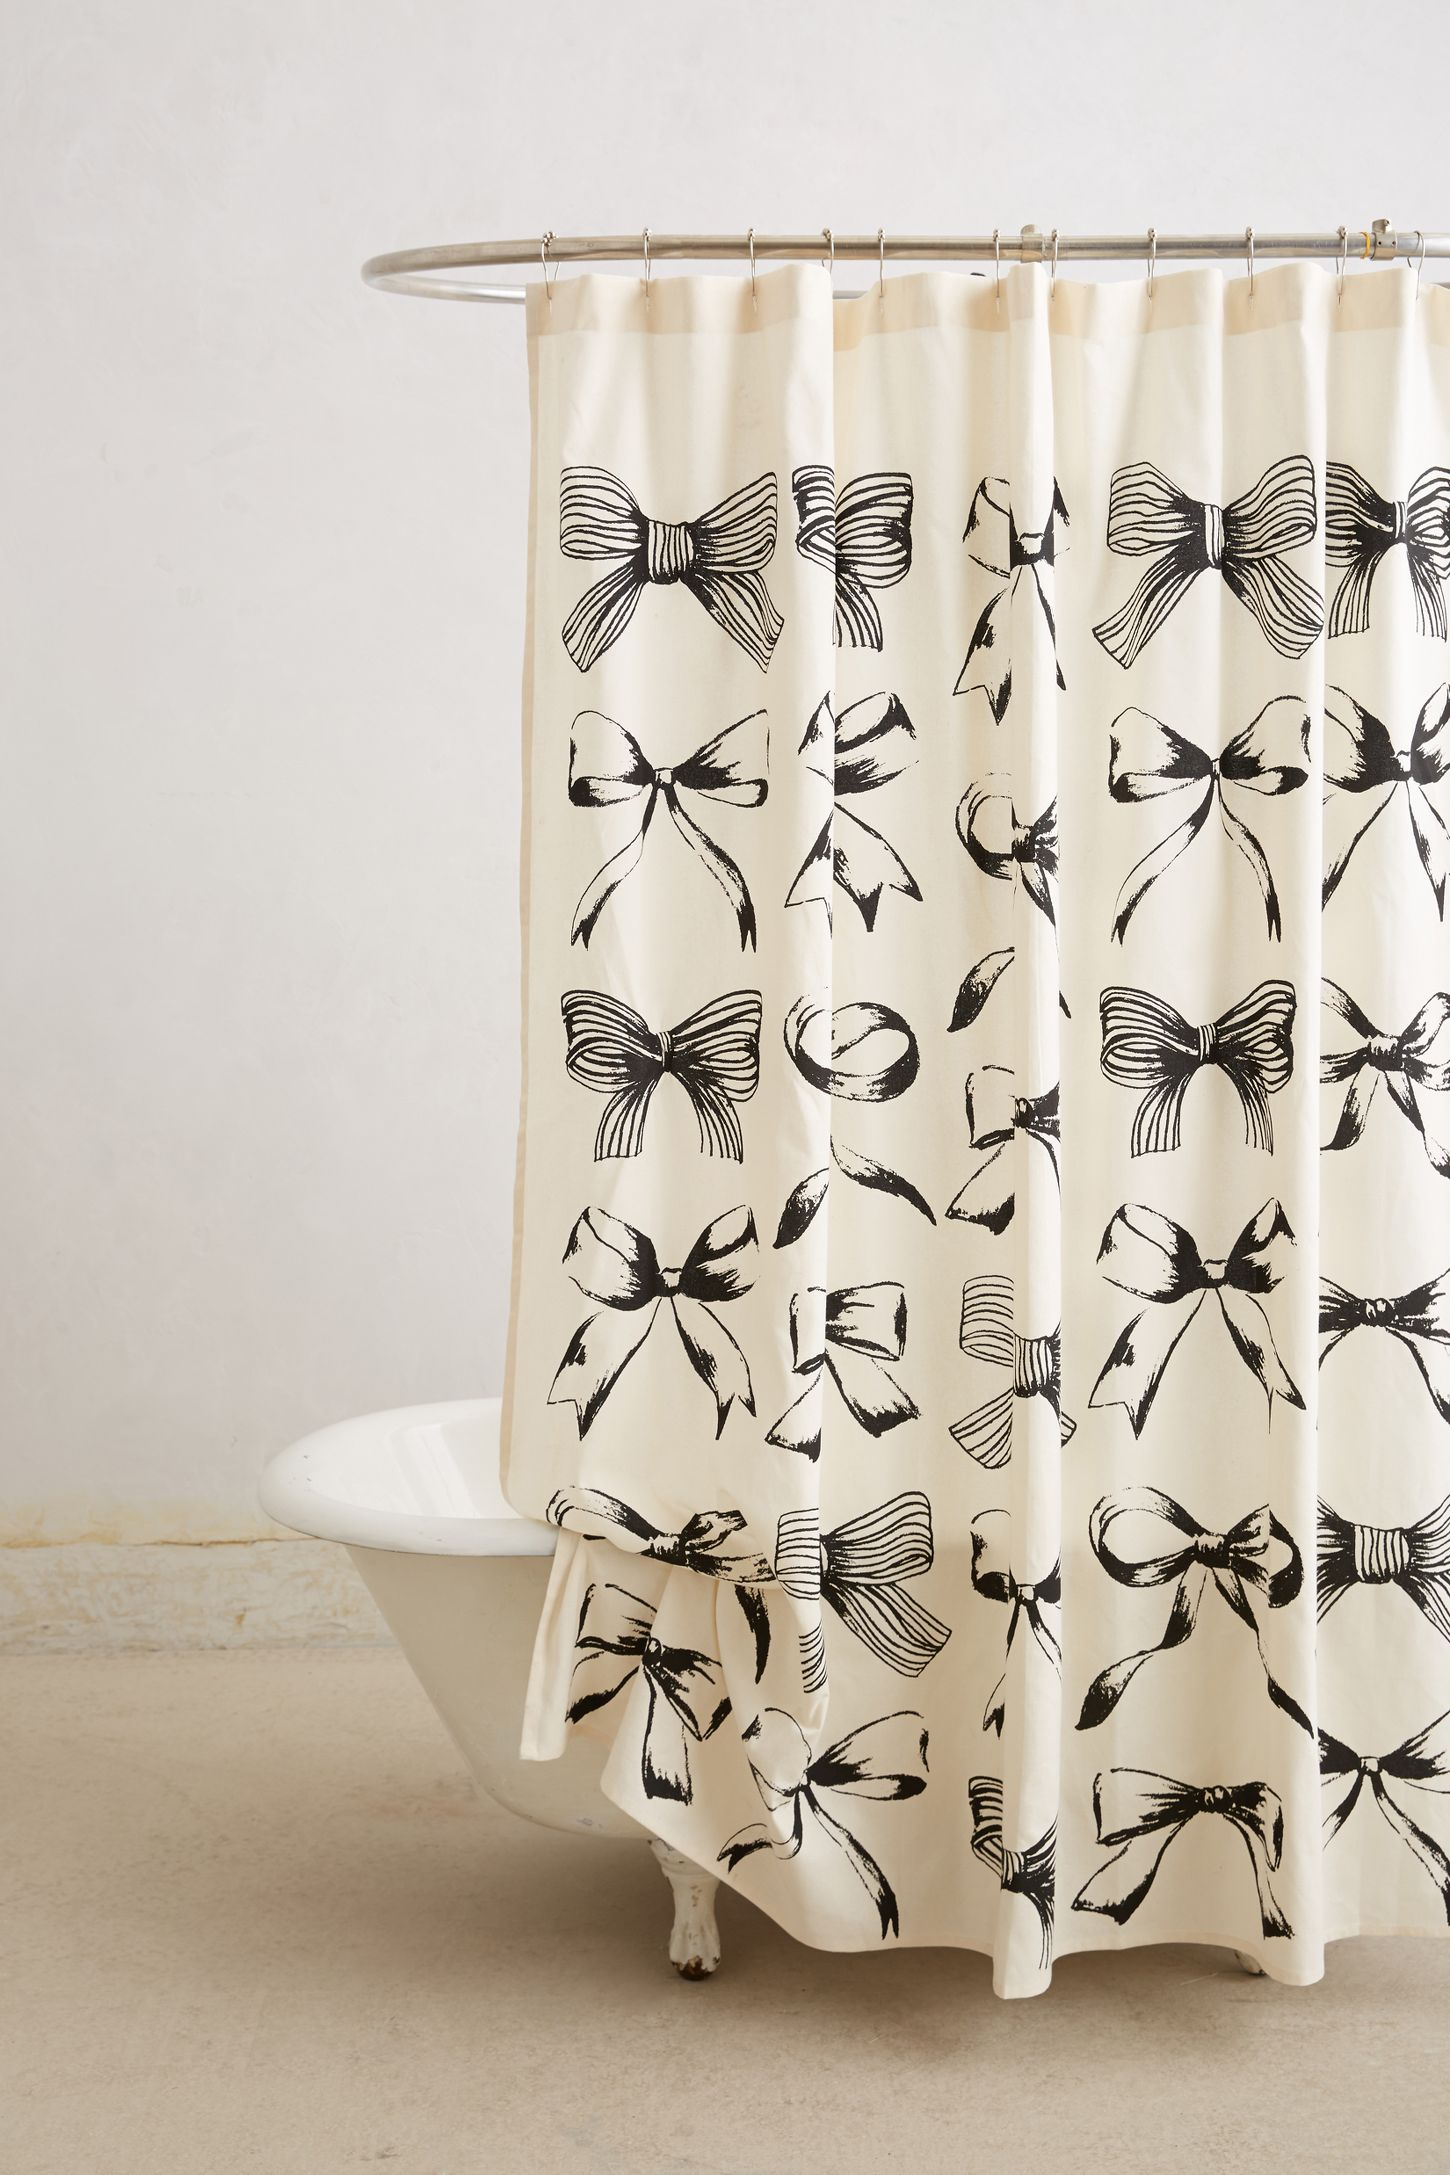 Anthropologie floral shower curtain - Anthropologie Floral Shower Curtain 39